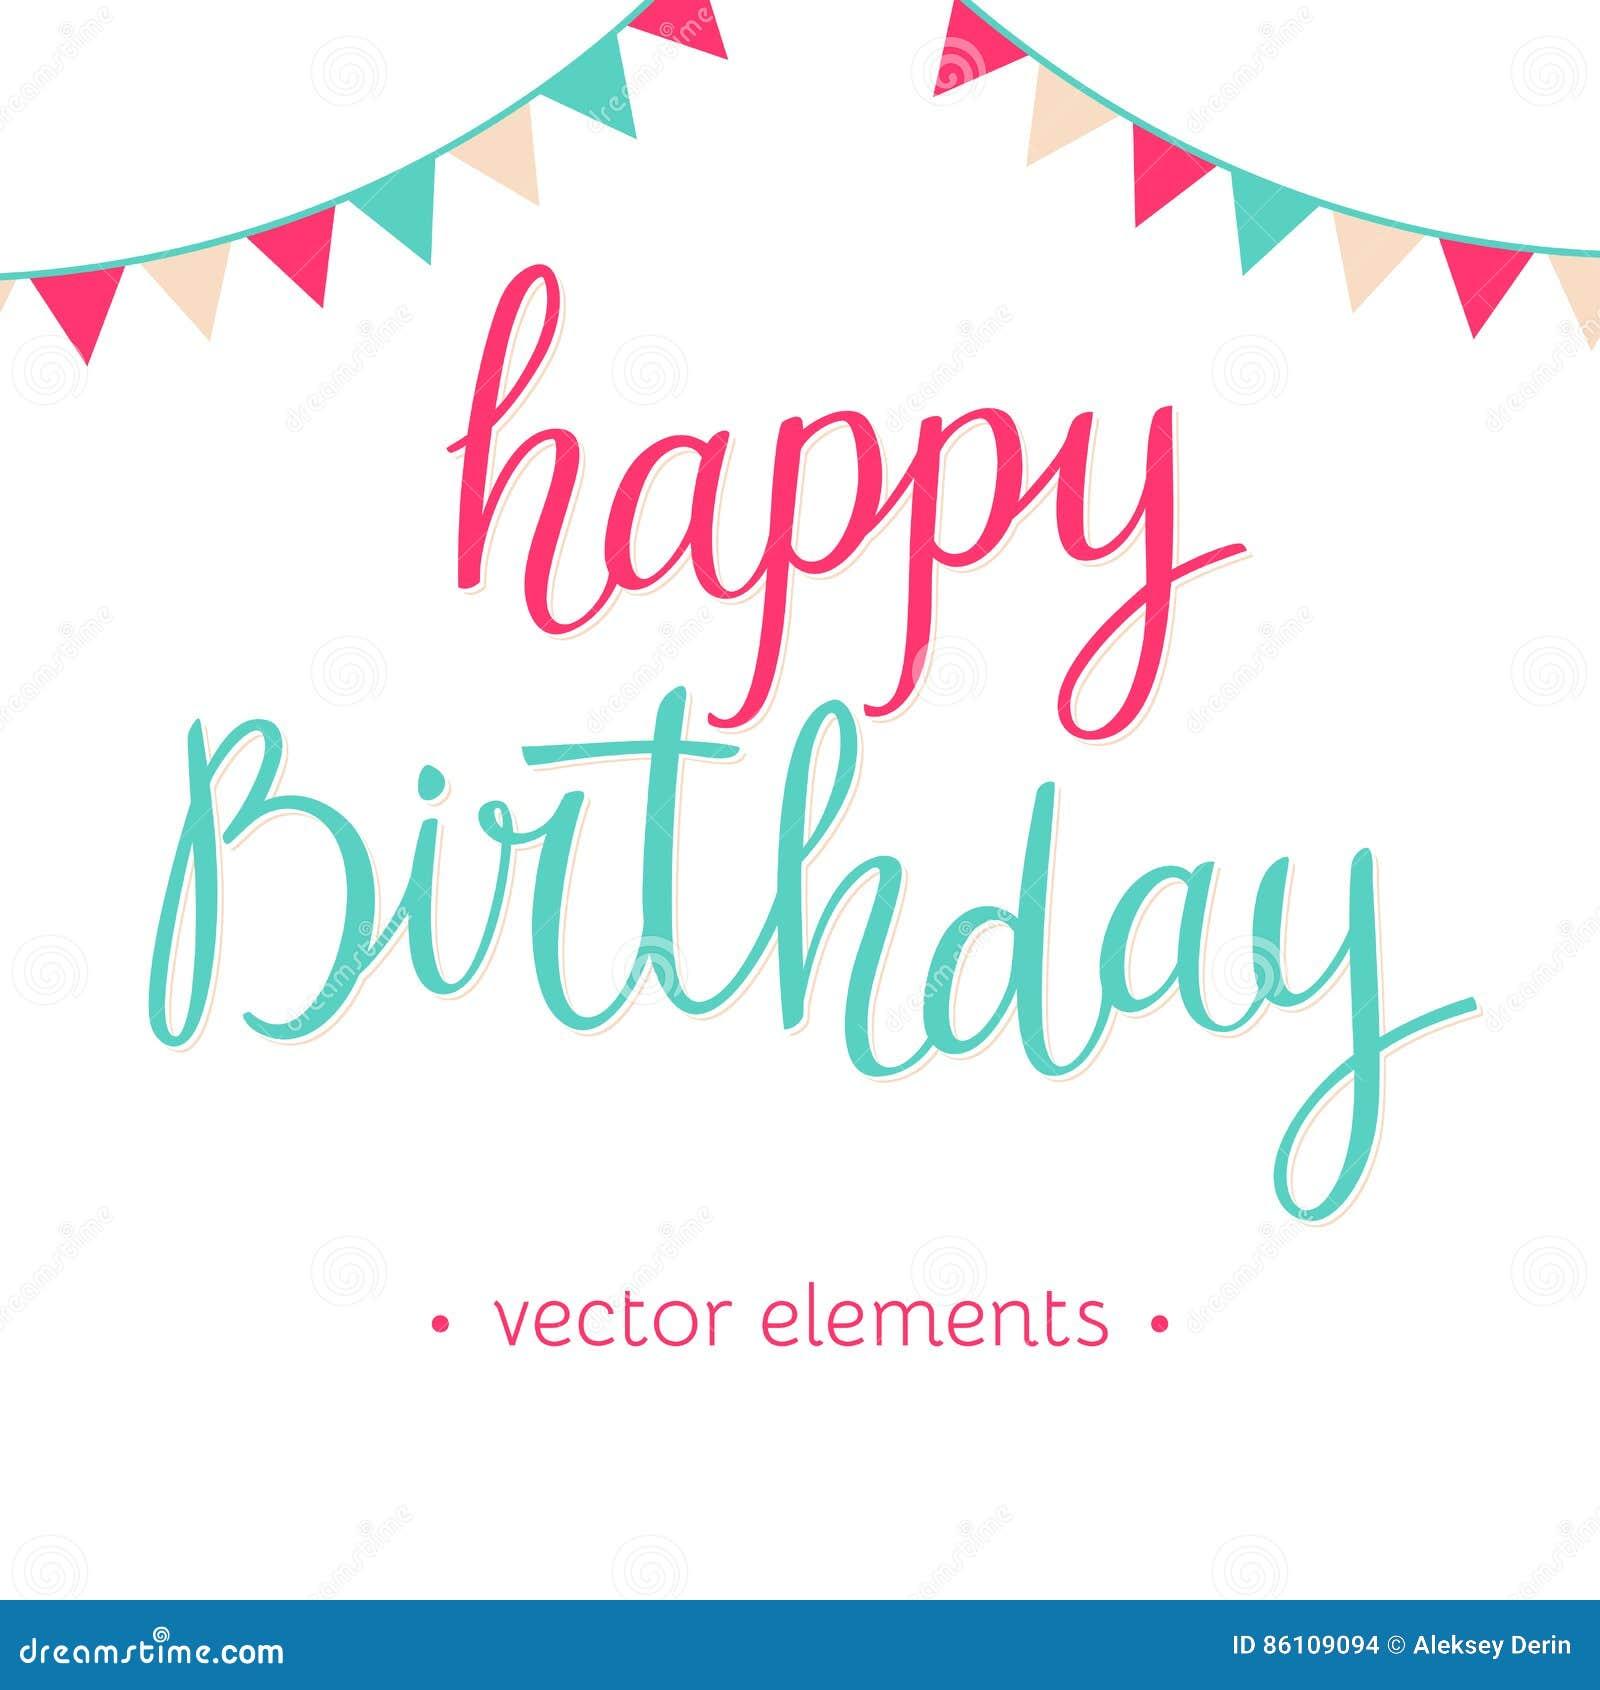 Modern hand drawn lettering happy birthday stock vector modern hand drawn lettering happy birthday graphic background bookmarktalkfo Choice Image